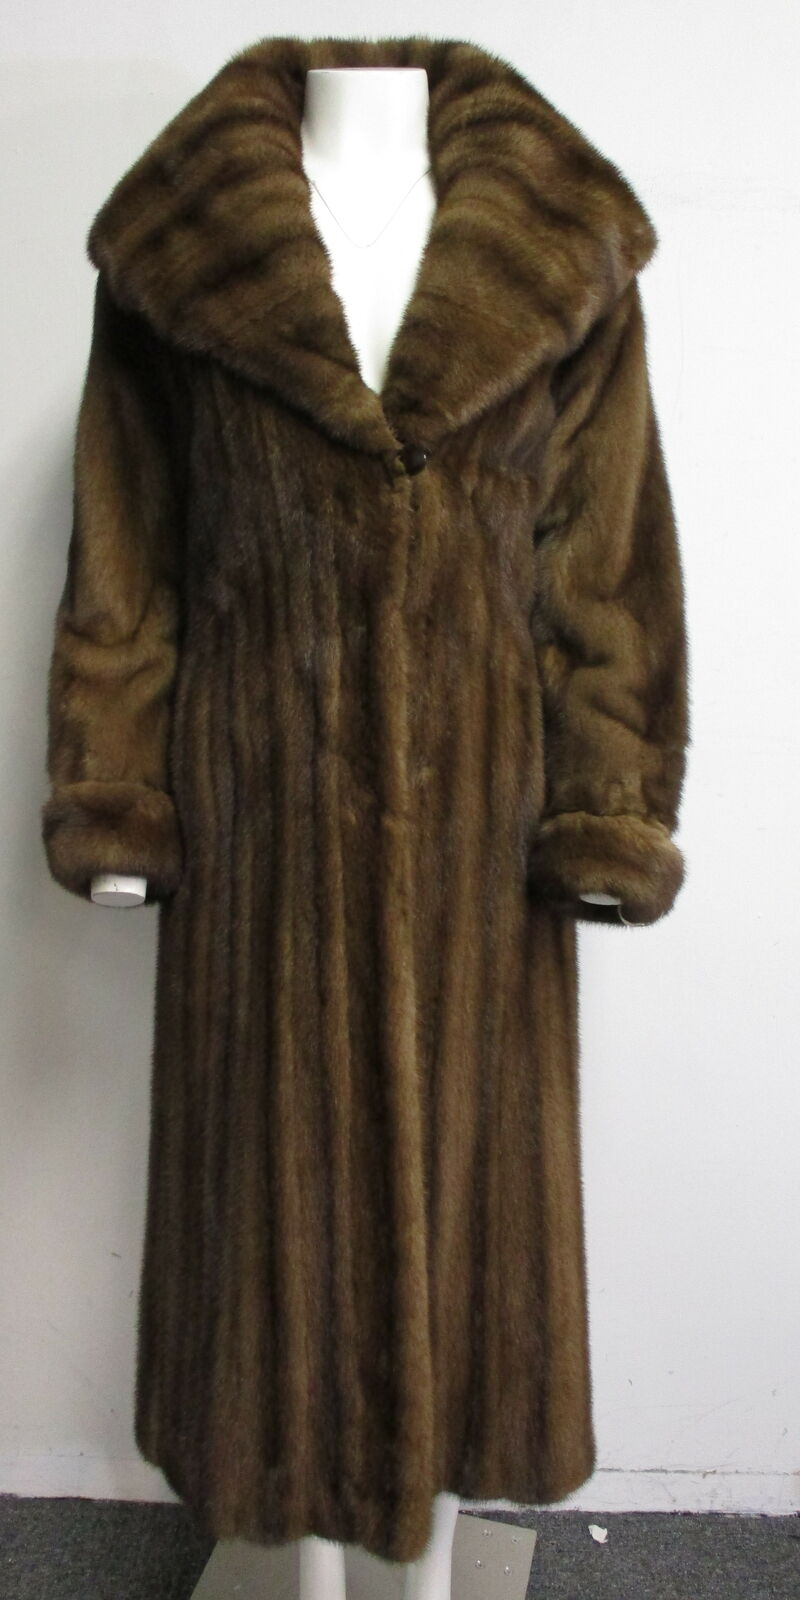 NAFA Mink Fur mahogany shawl collar full length coat womens sz 4